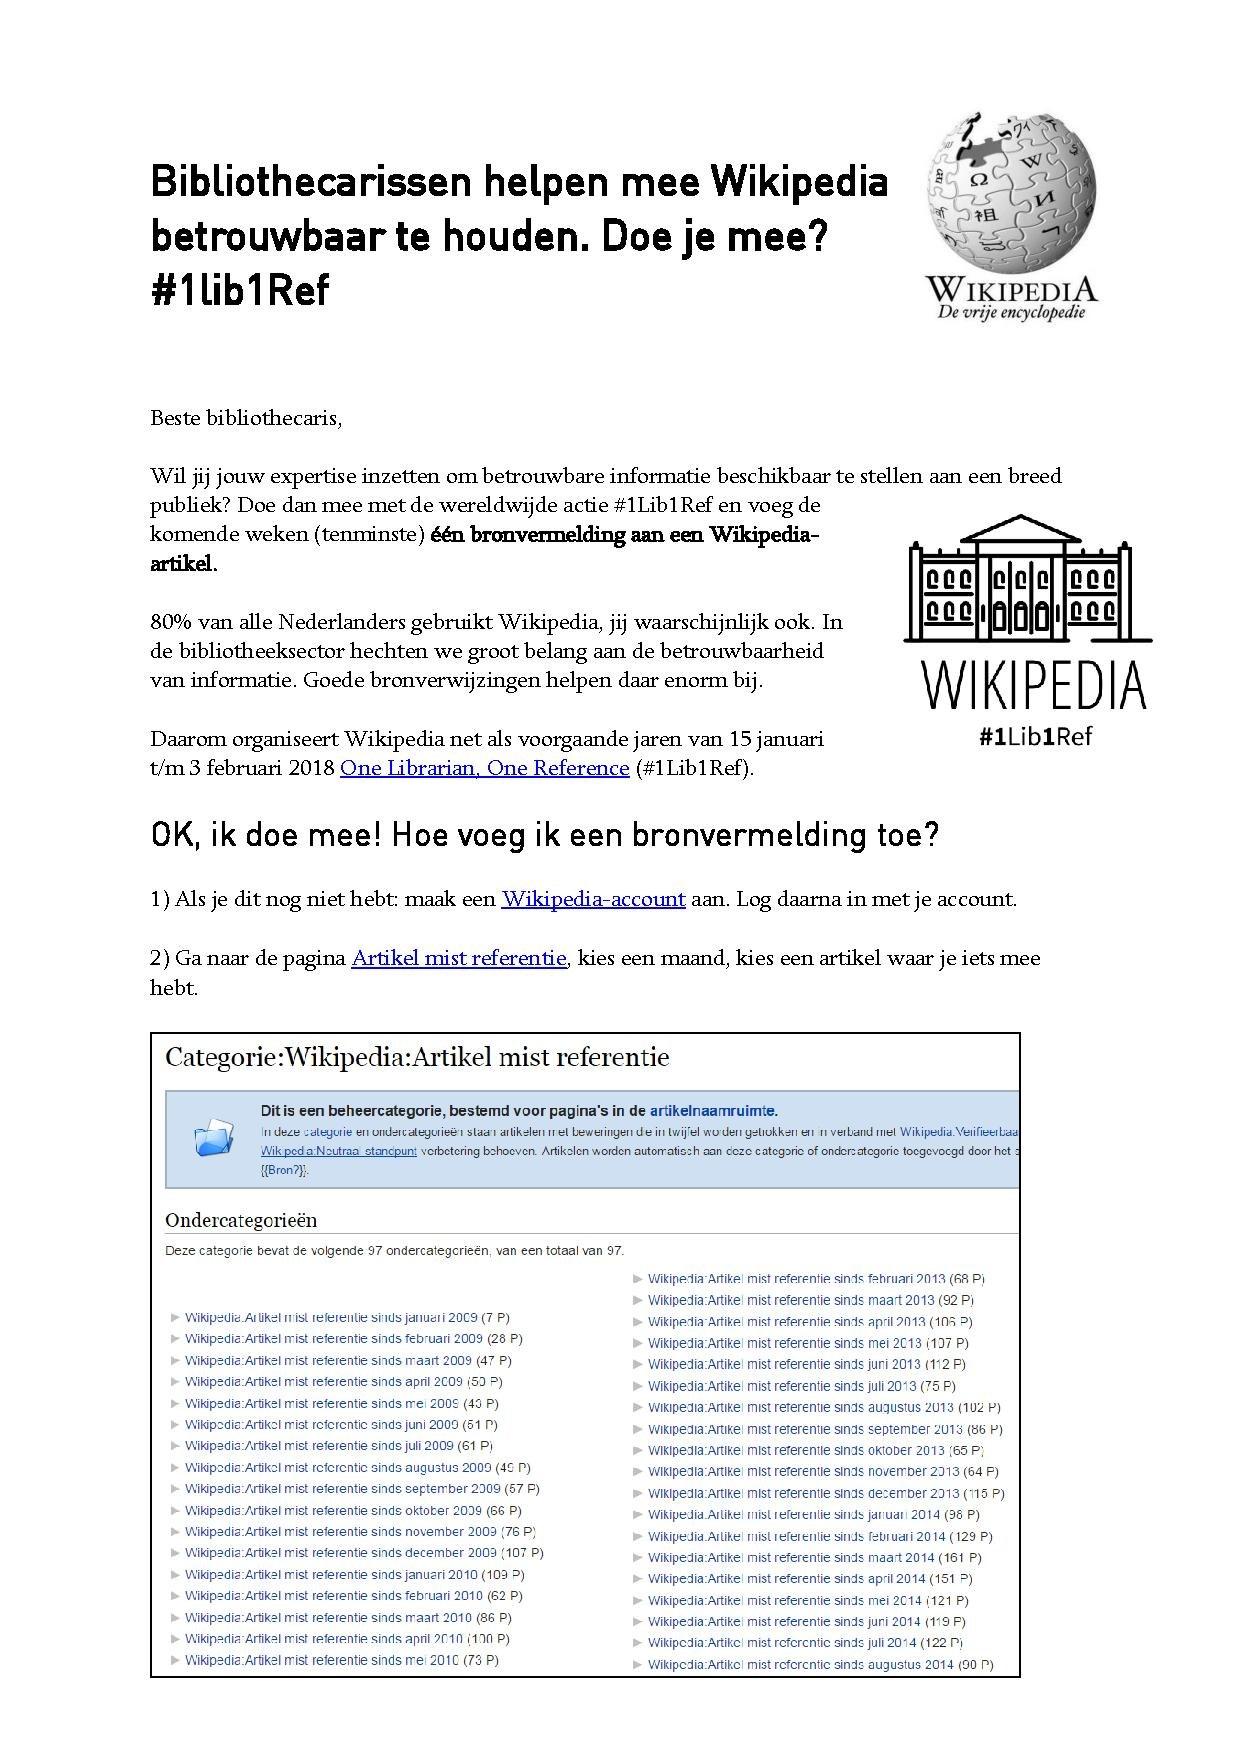 Filehandleiding 1lib1ref Nederlandspdf Wikimedia Commons